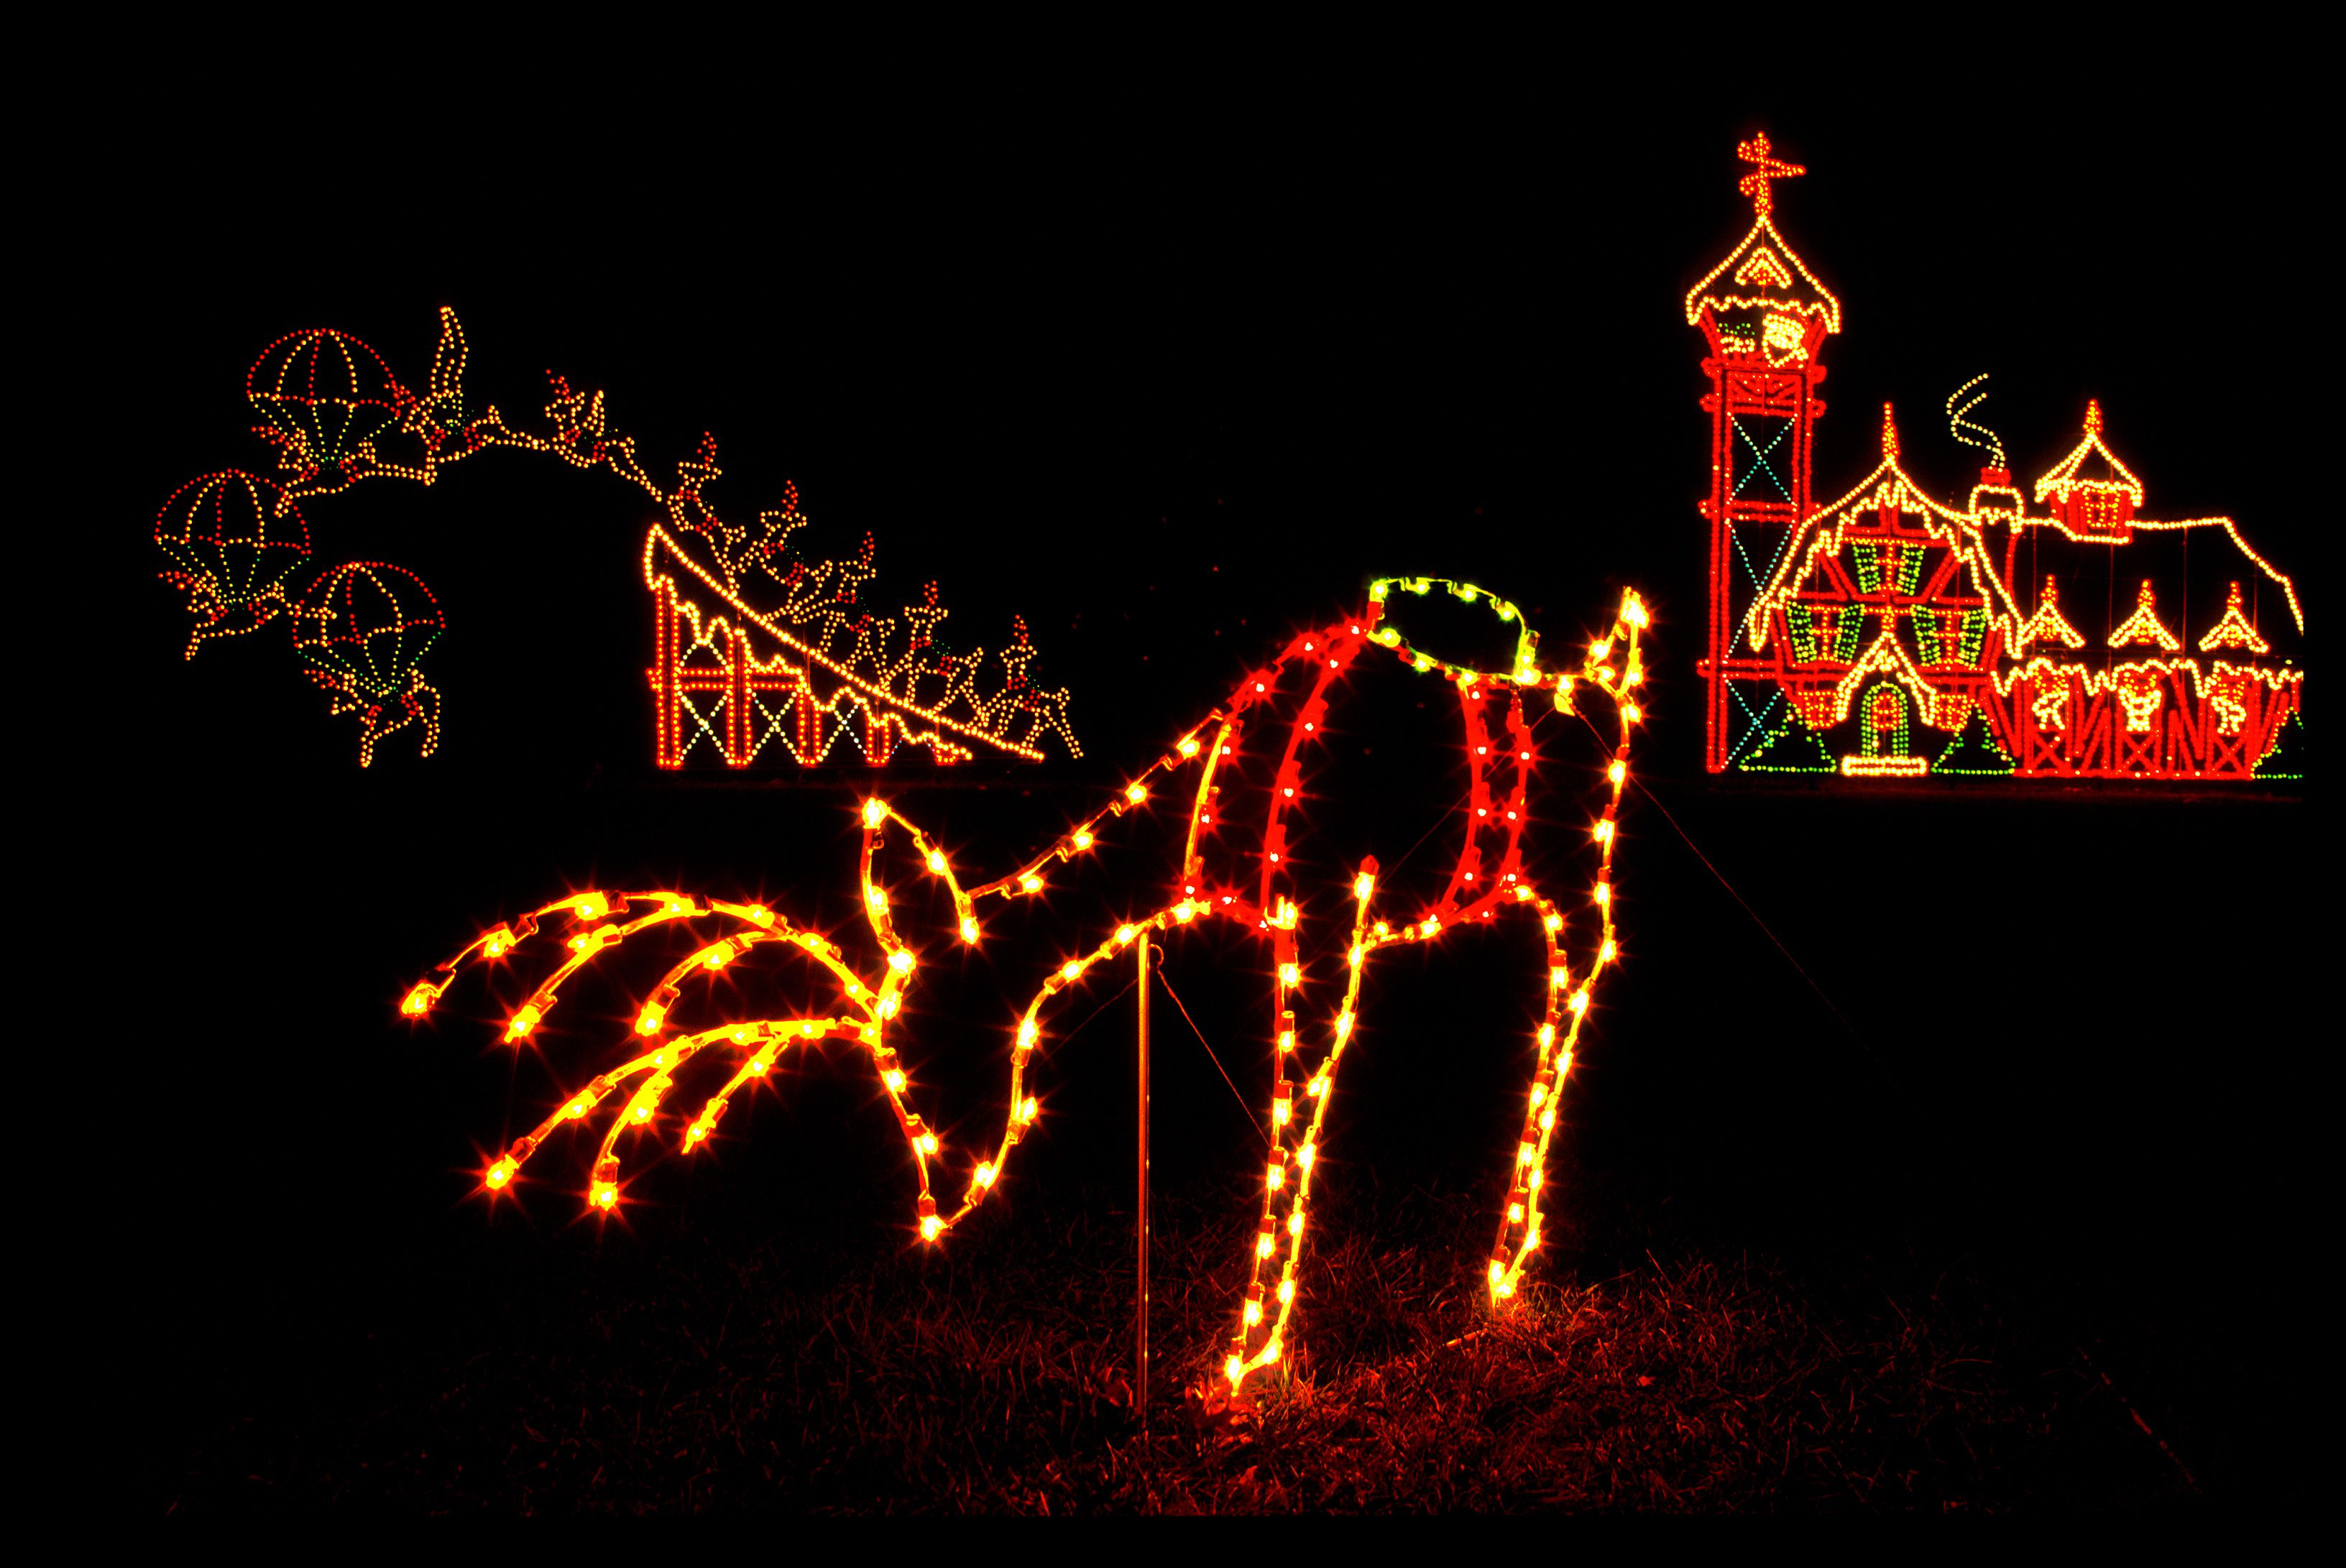 Winter Lights at Seneca Creek State Park Gaithersburg MD